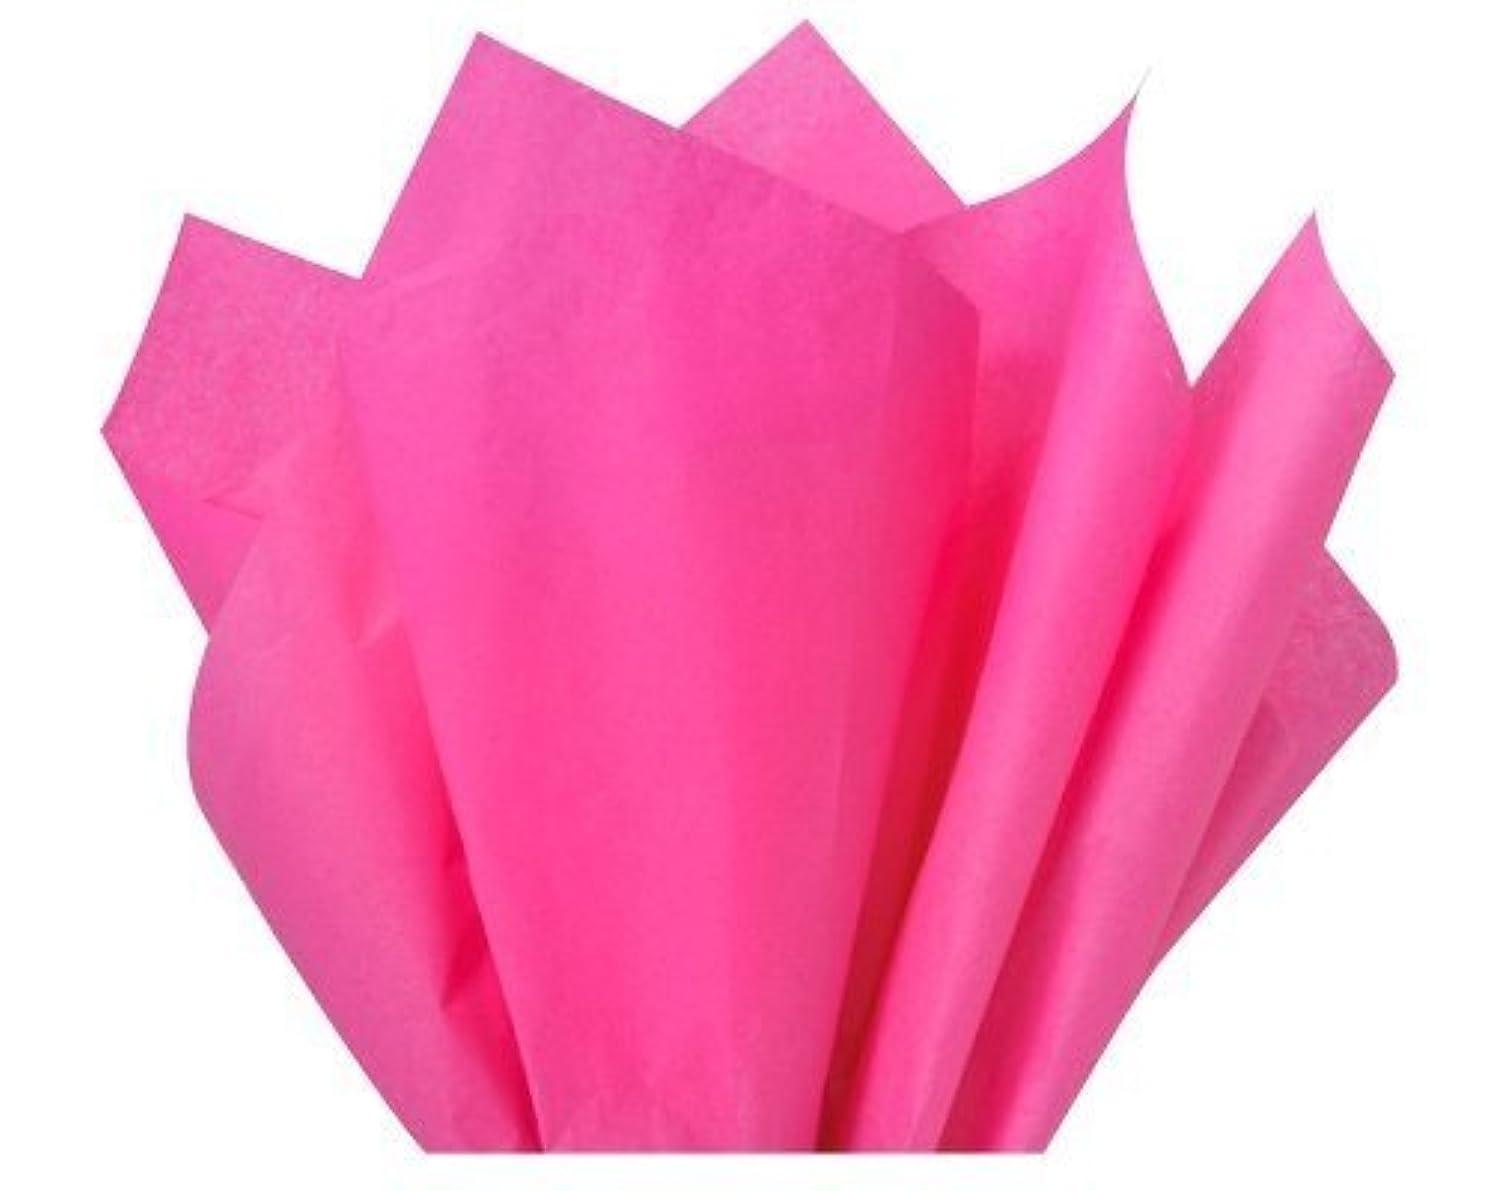 Brand New Hot Pink Bulk Tissue Paper 15 Inch x 20 Inch - 100 Sheet